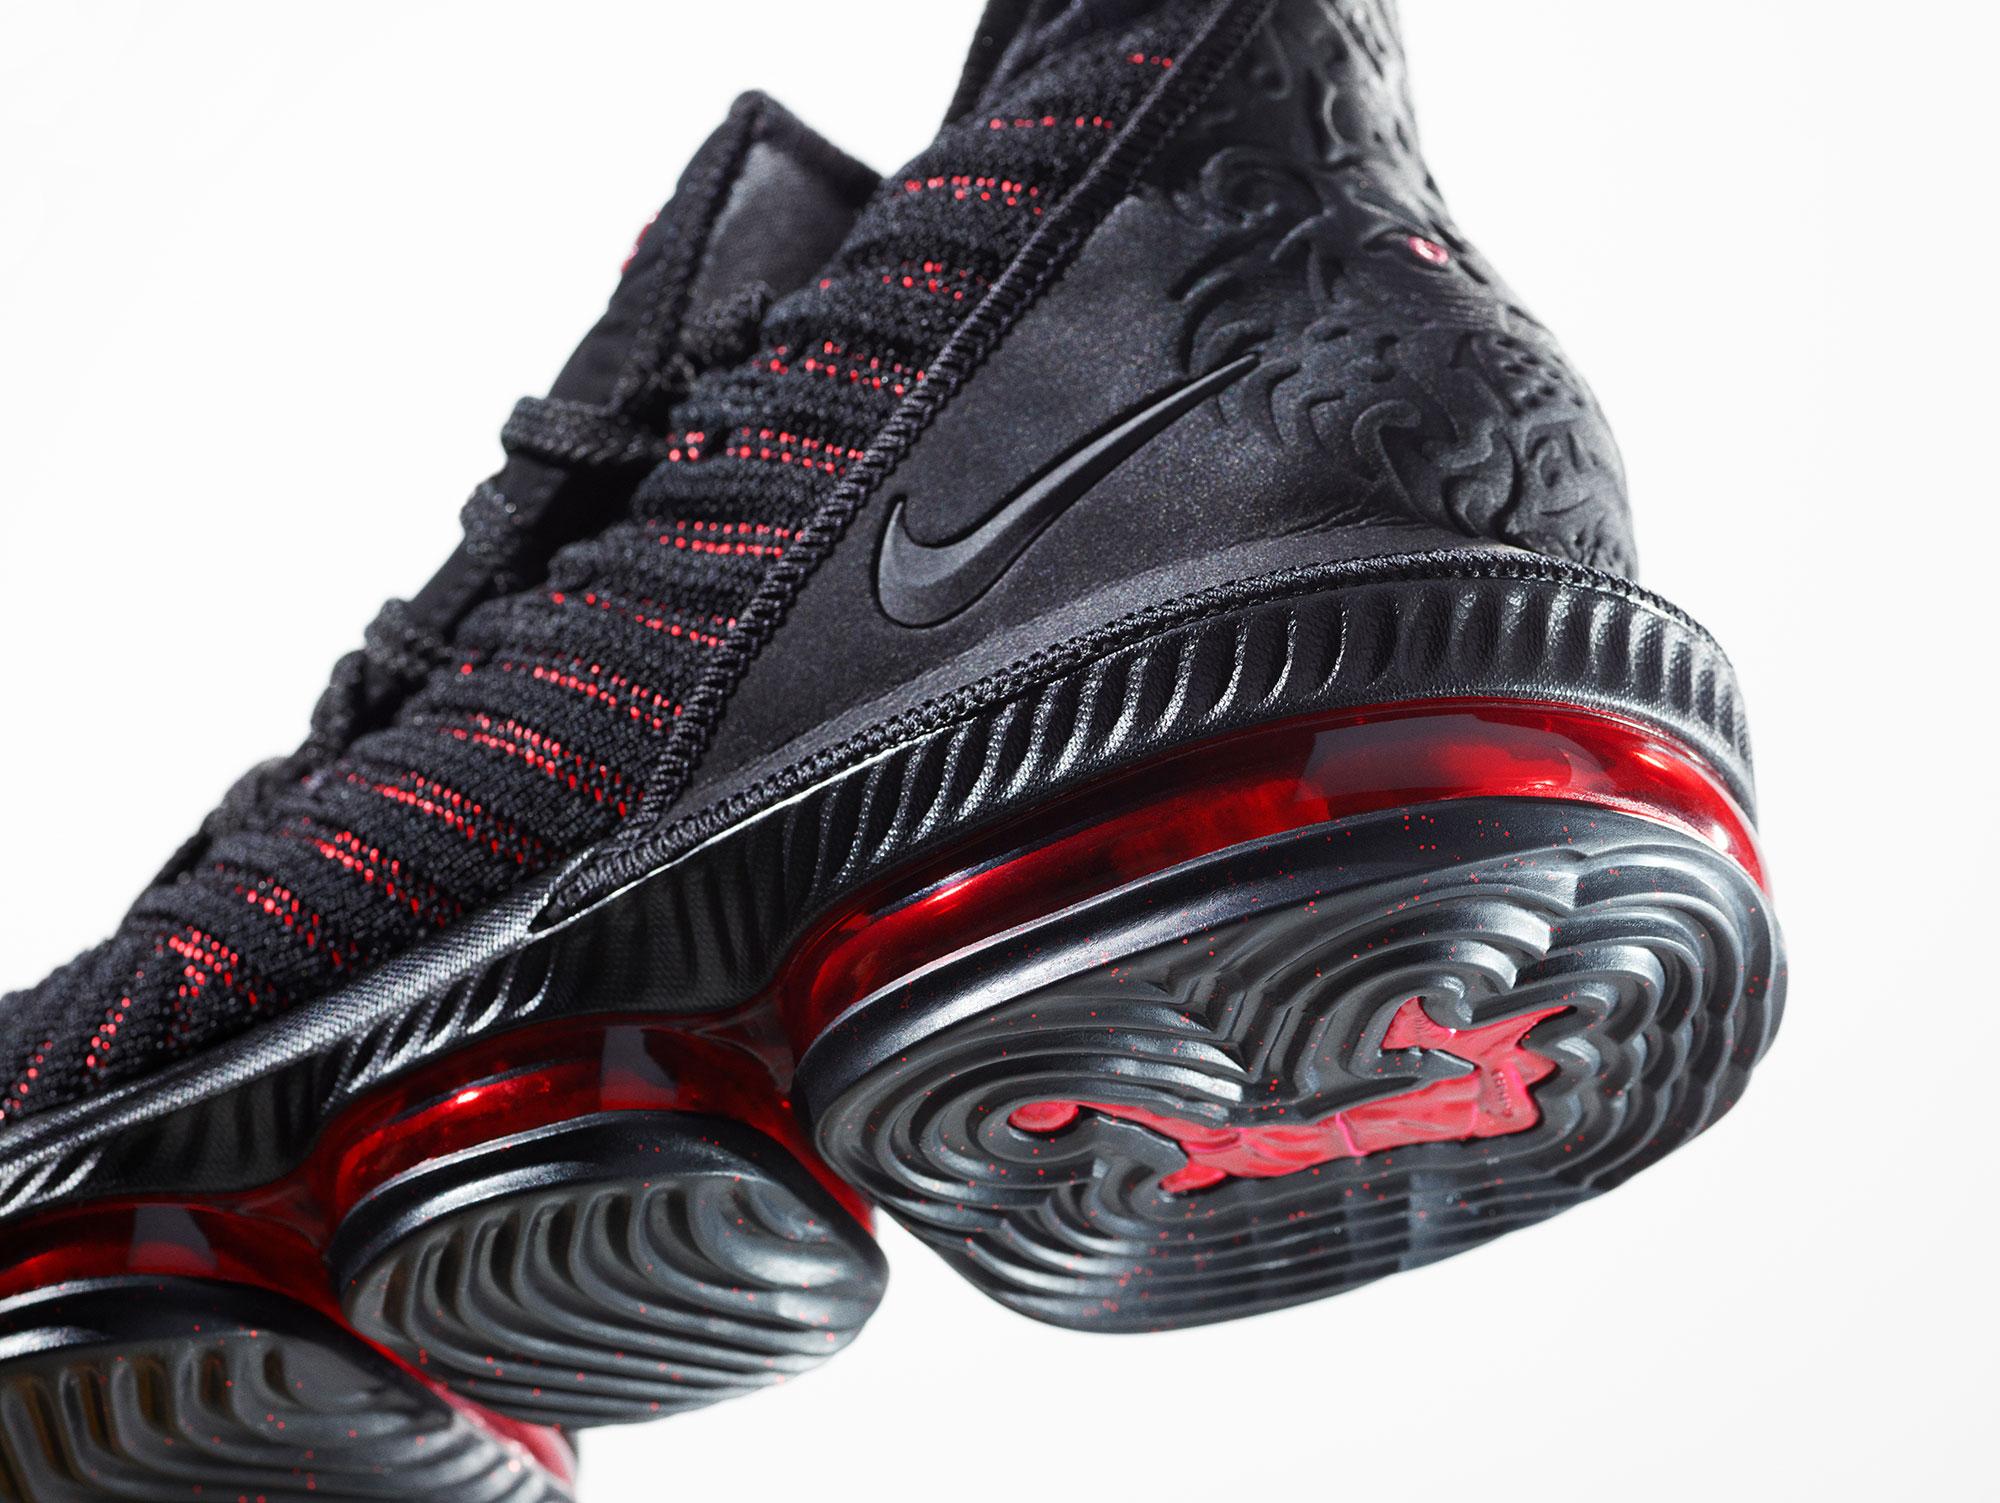 Nike LeBron 16 – Footwear